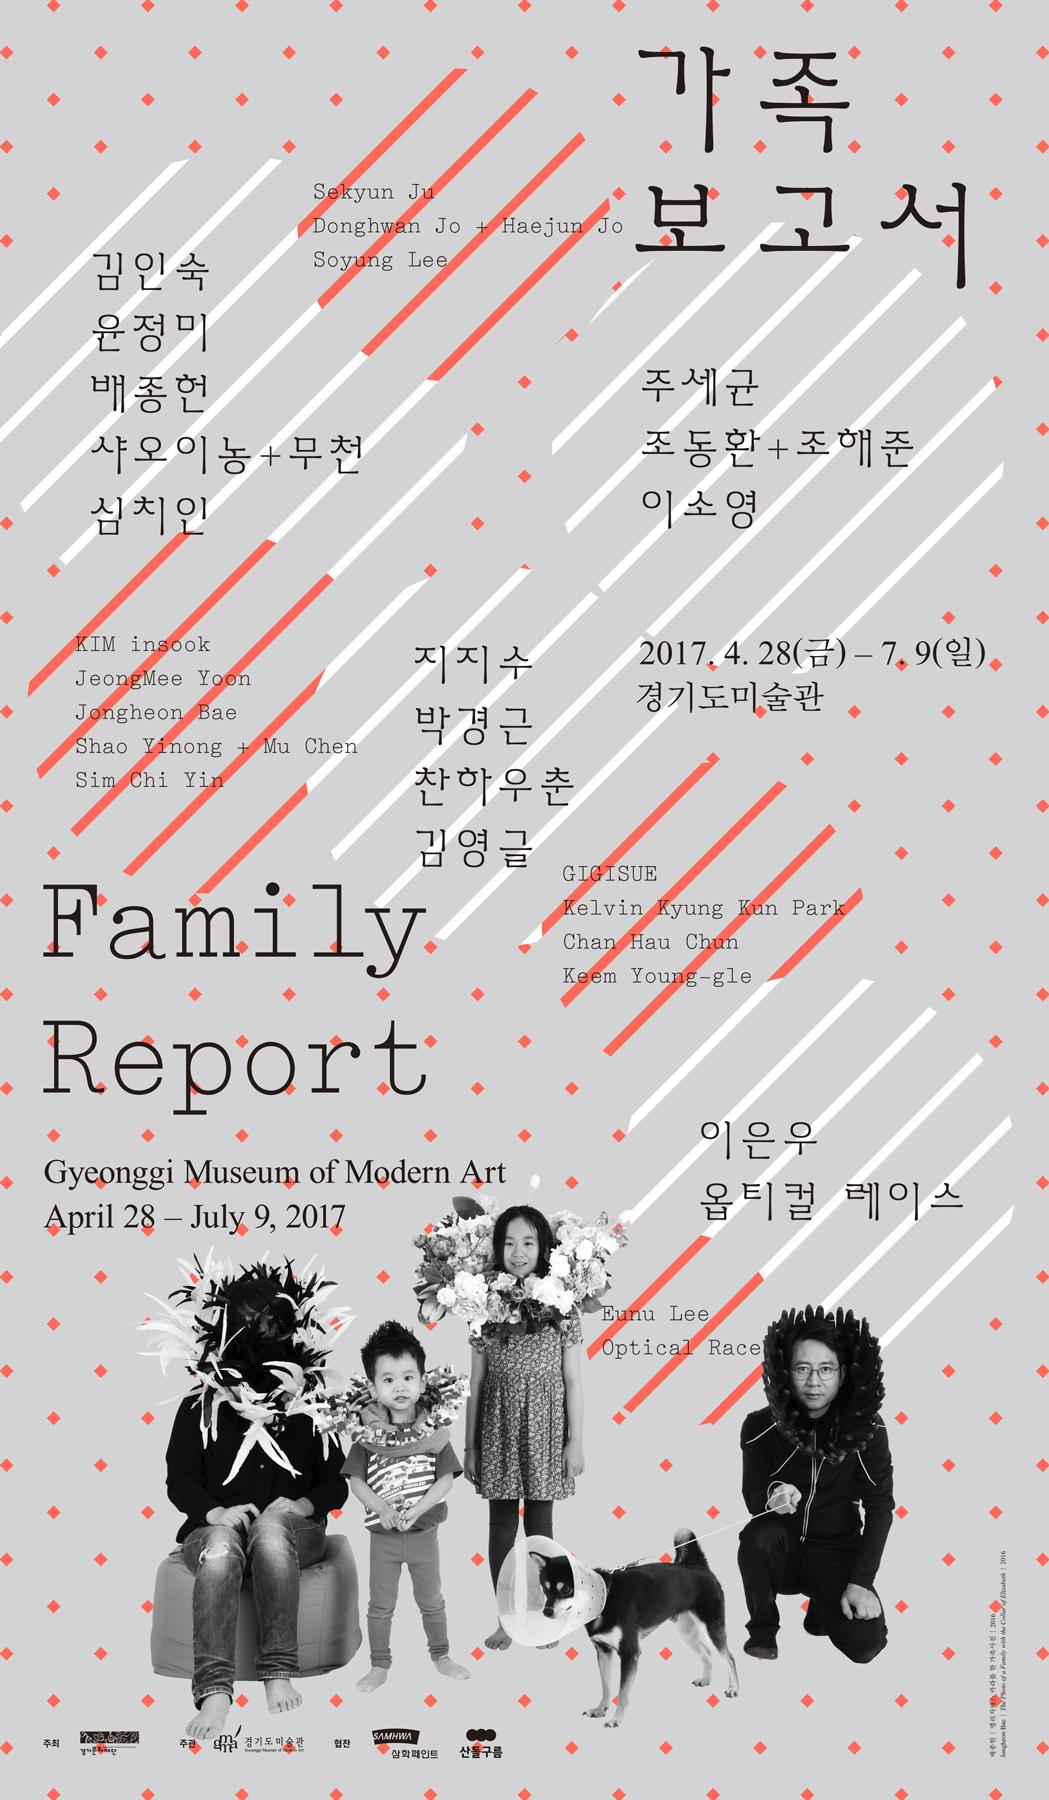 Family Report